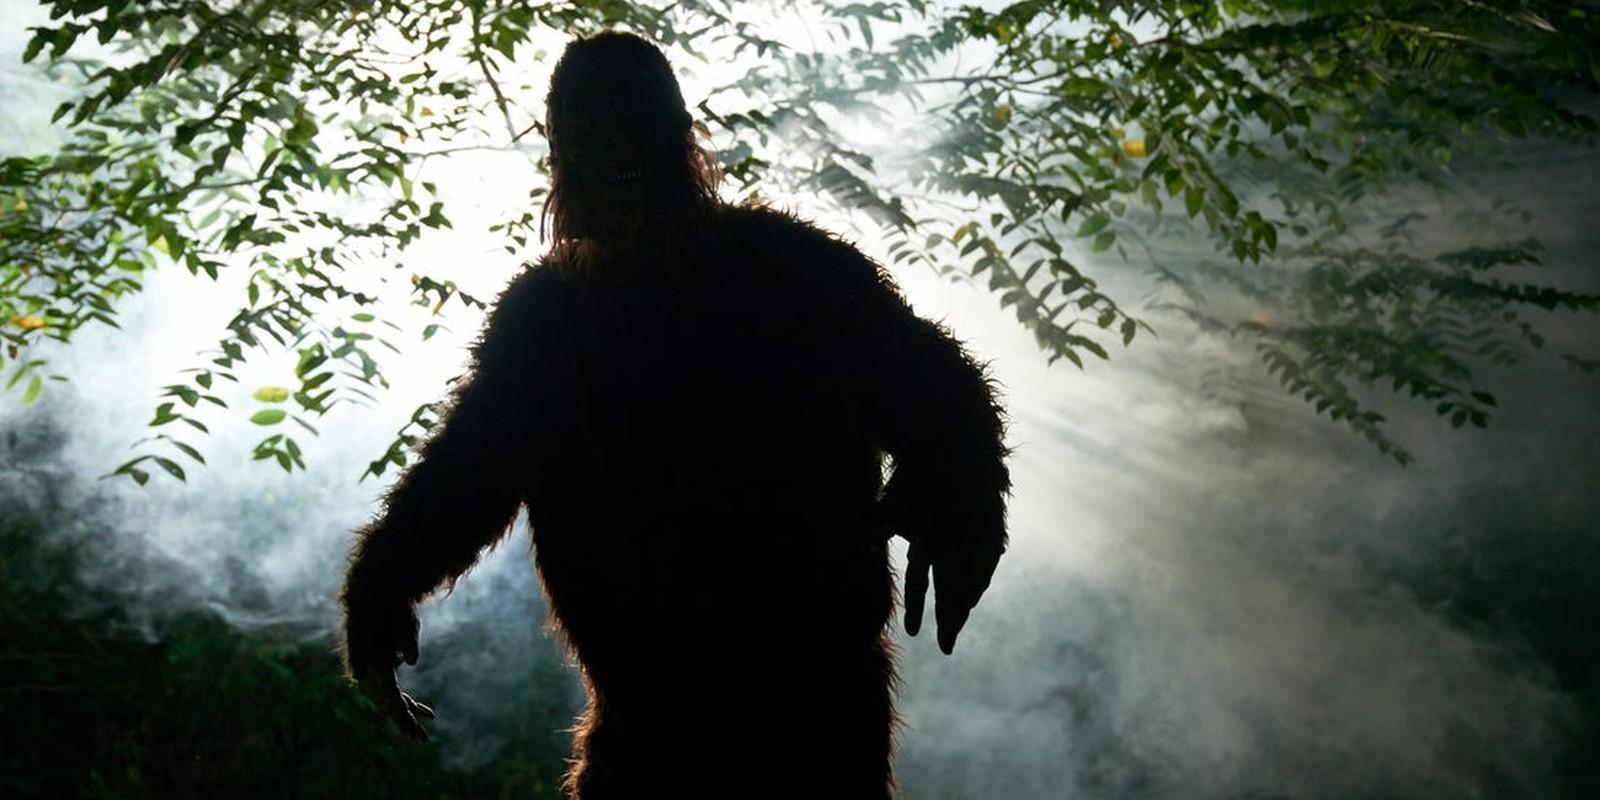 Vi sao con nguoi kho bat duoc quai vat Bigfoot?